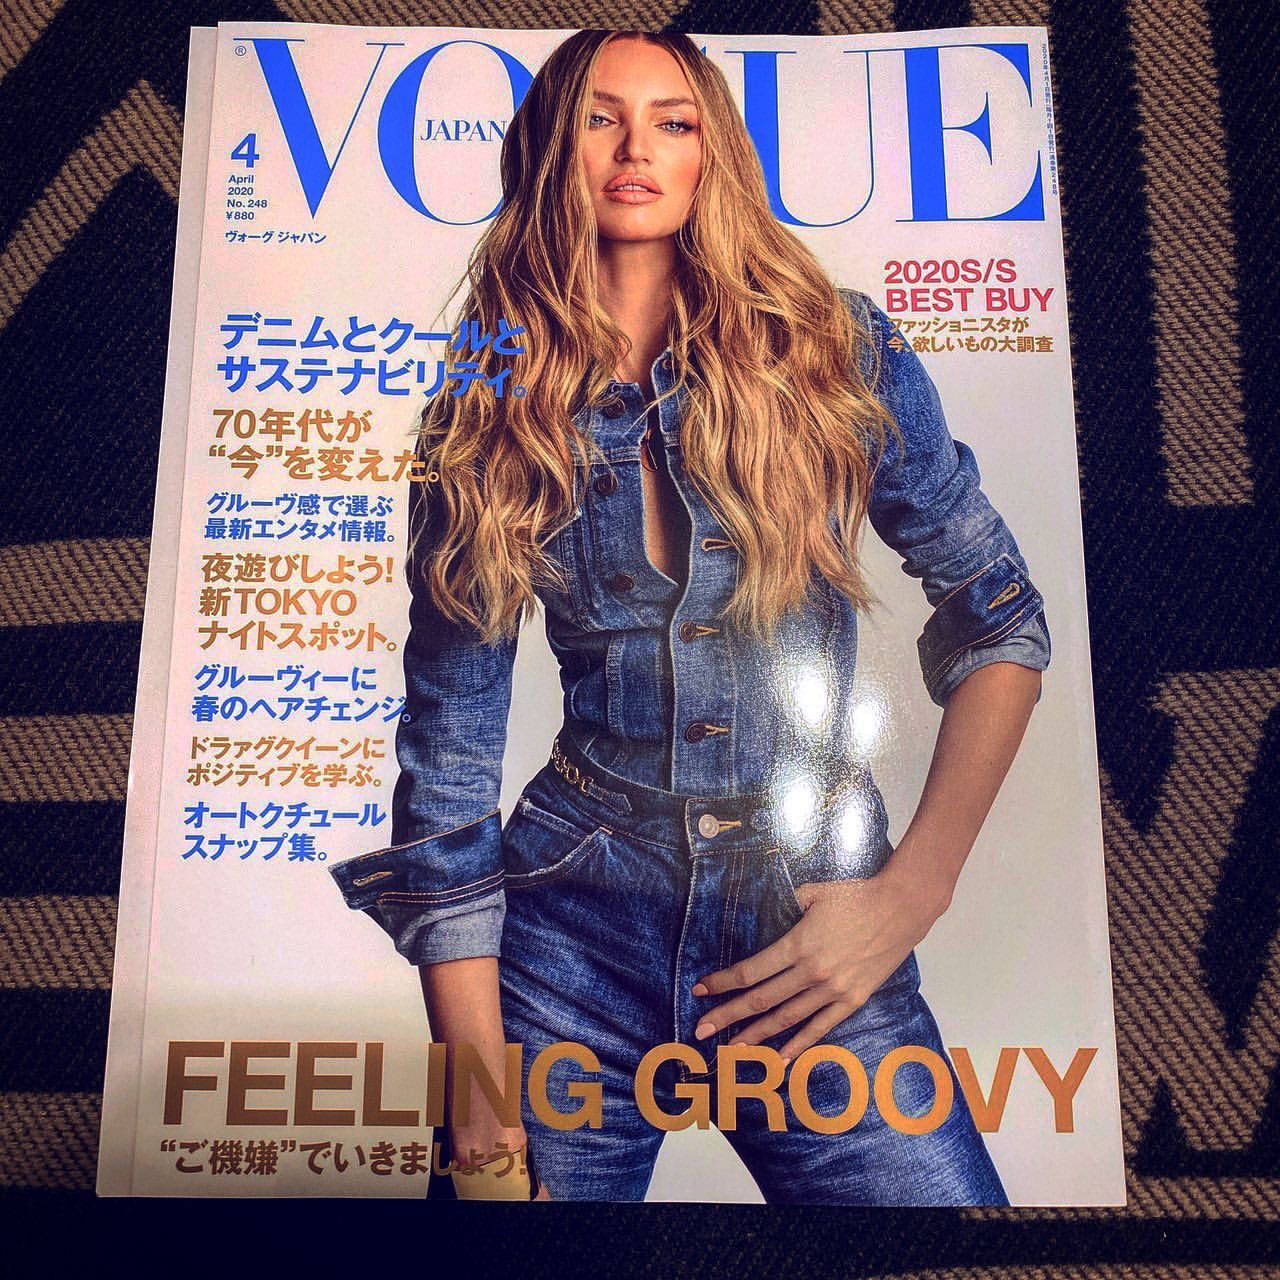 2020.02.28 KUJIRAがファッション誌「VOGUE」に掲載!!